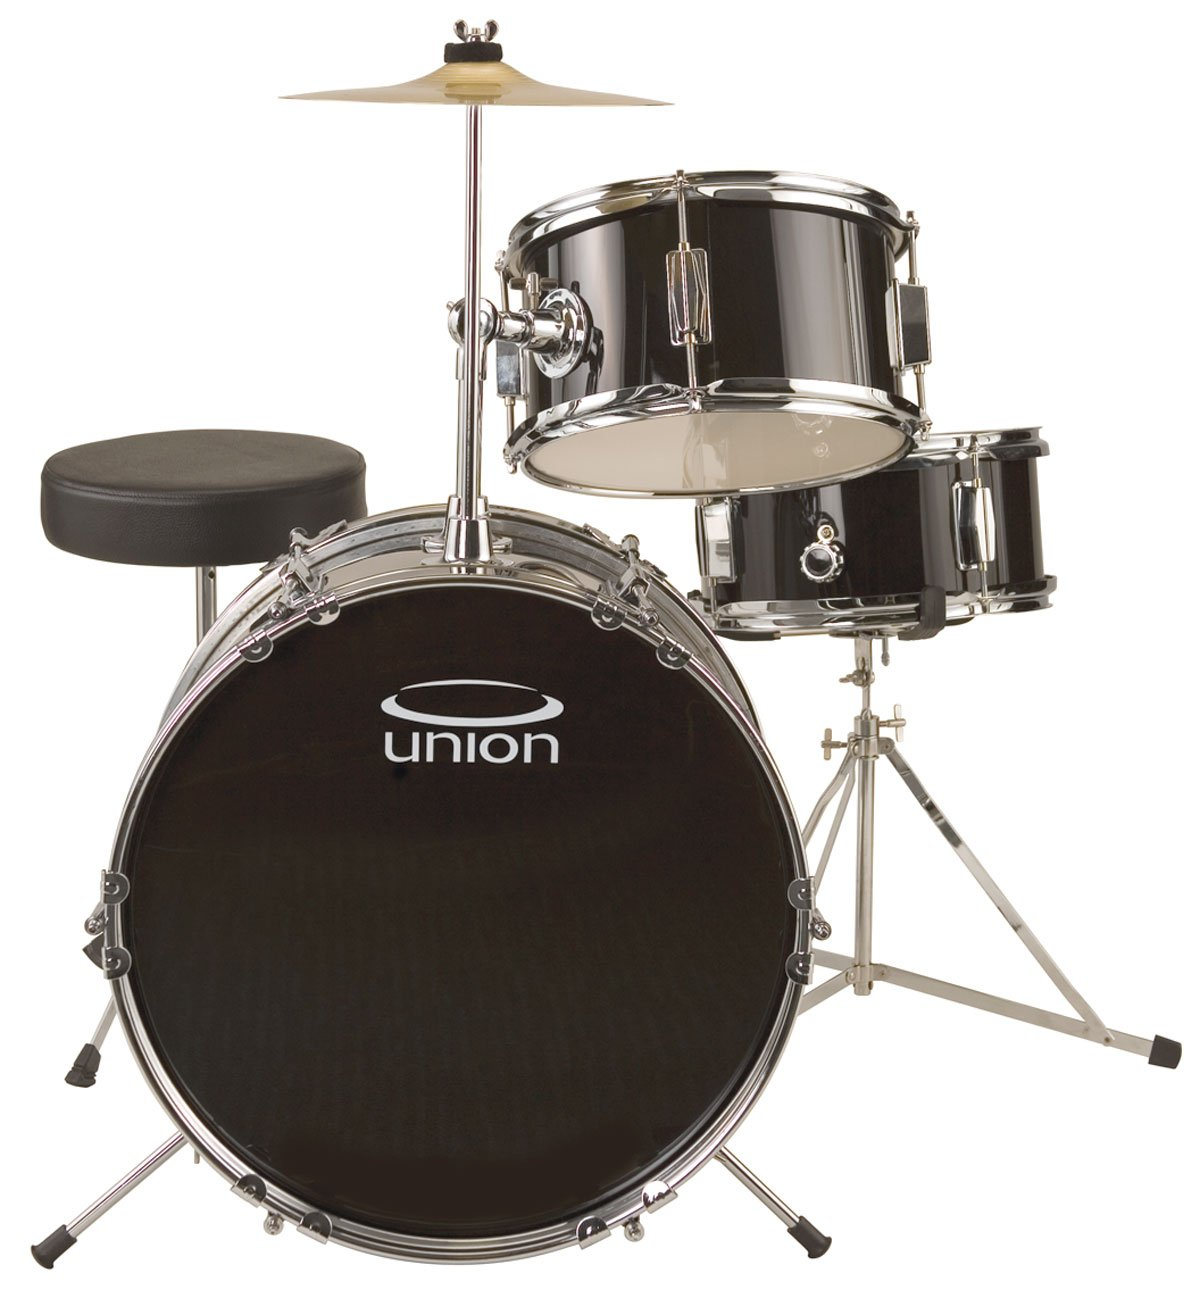 Union UJ3 3-piece Junior Drum Set - Black